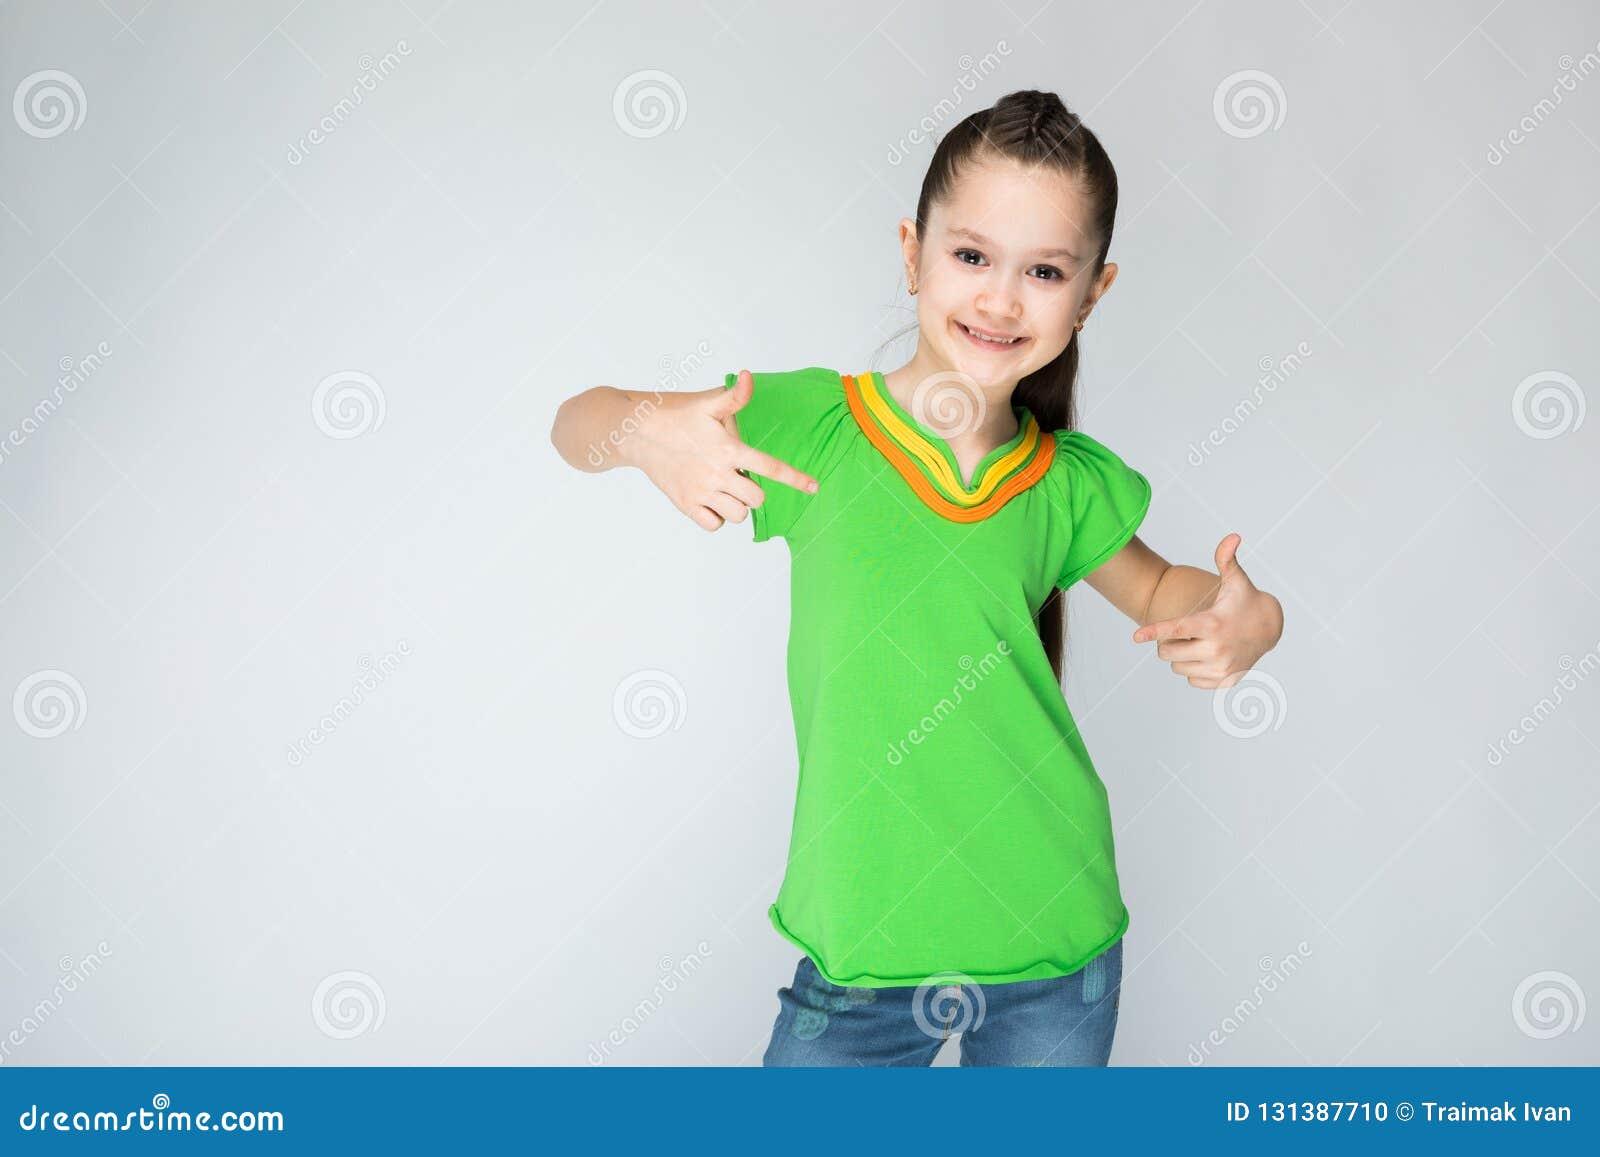 Corina nude gymnast